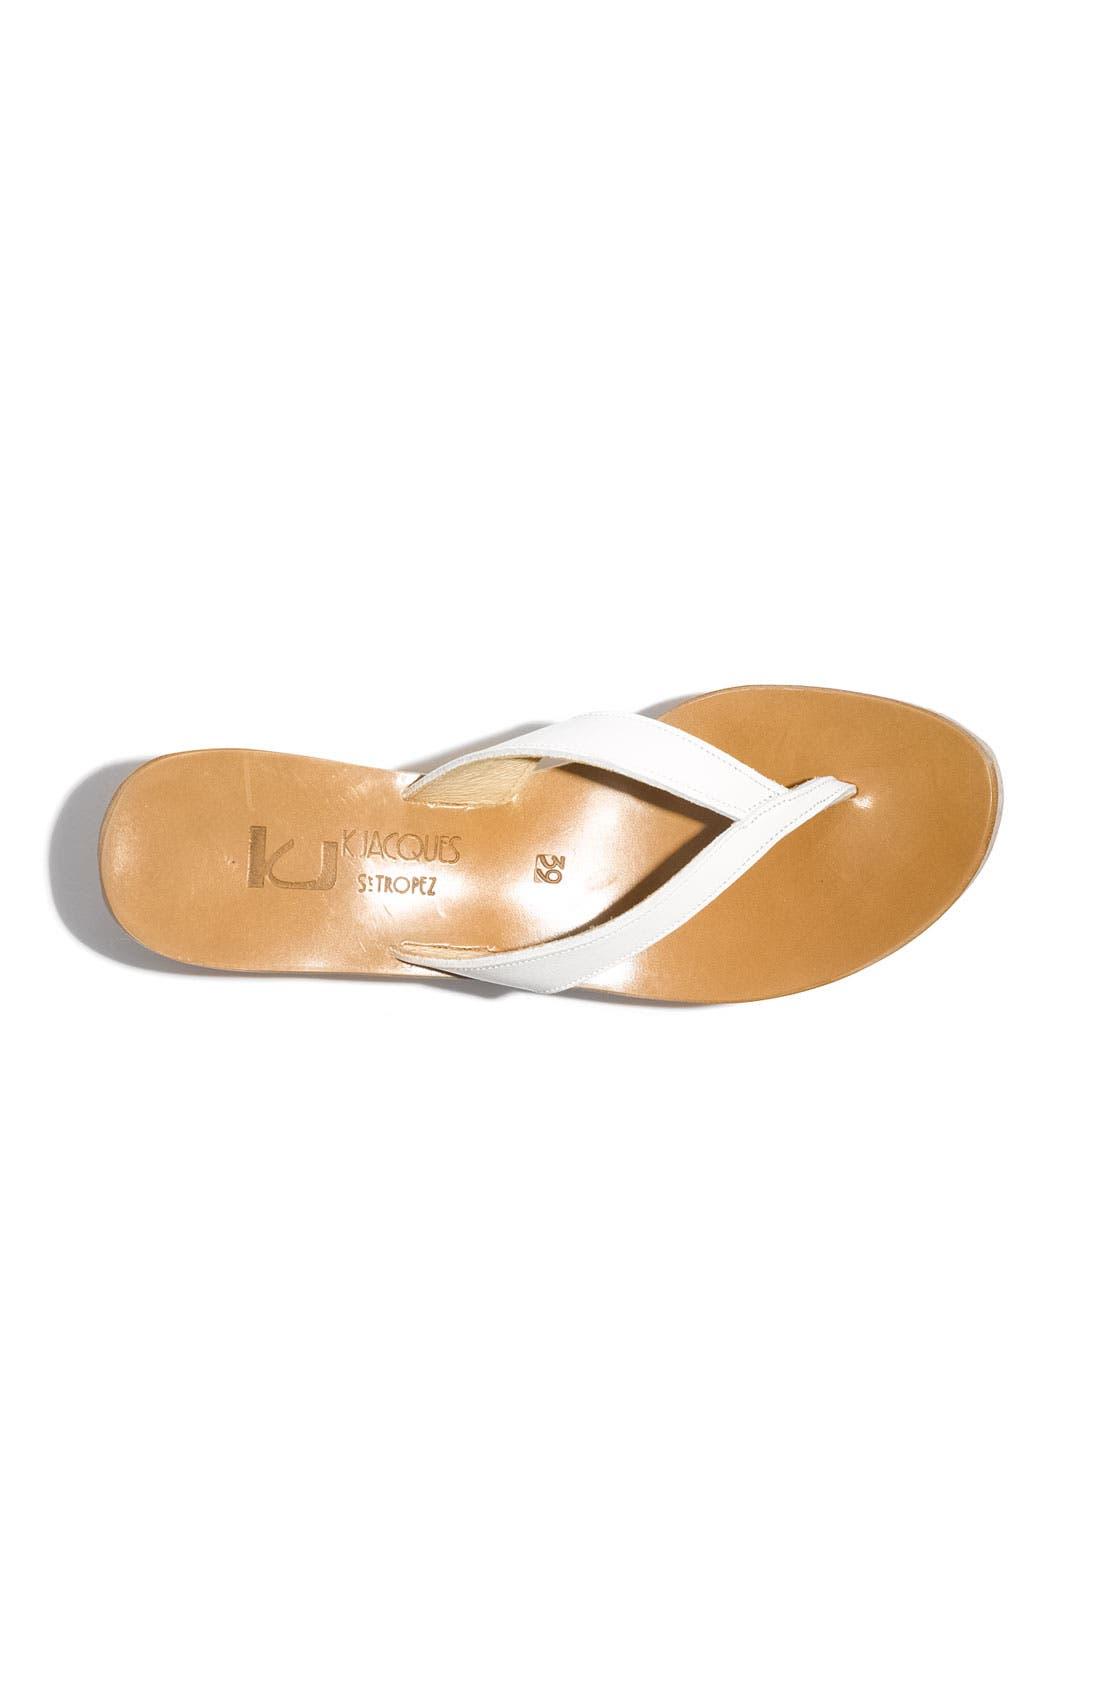 Alternate Image 2  - K.Jacques St. Tropez 'Diorite' Wedge Sandal